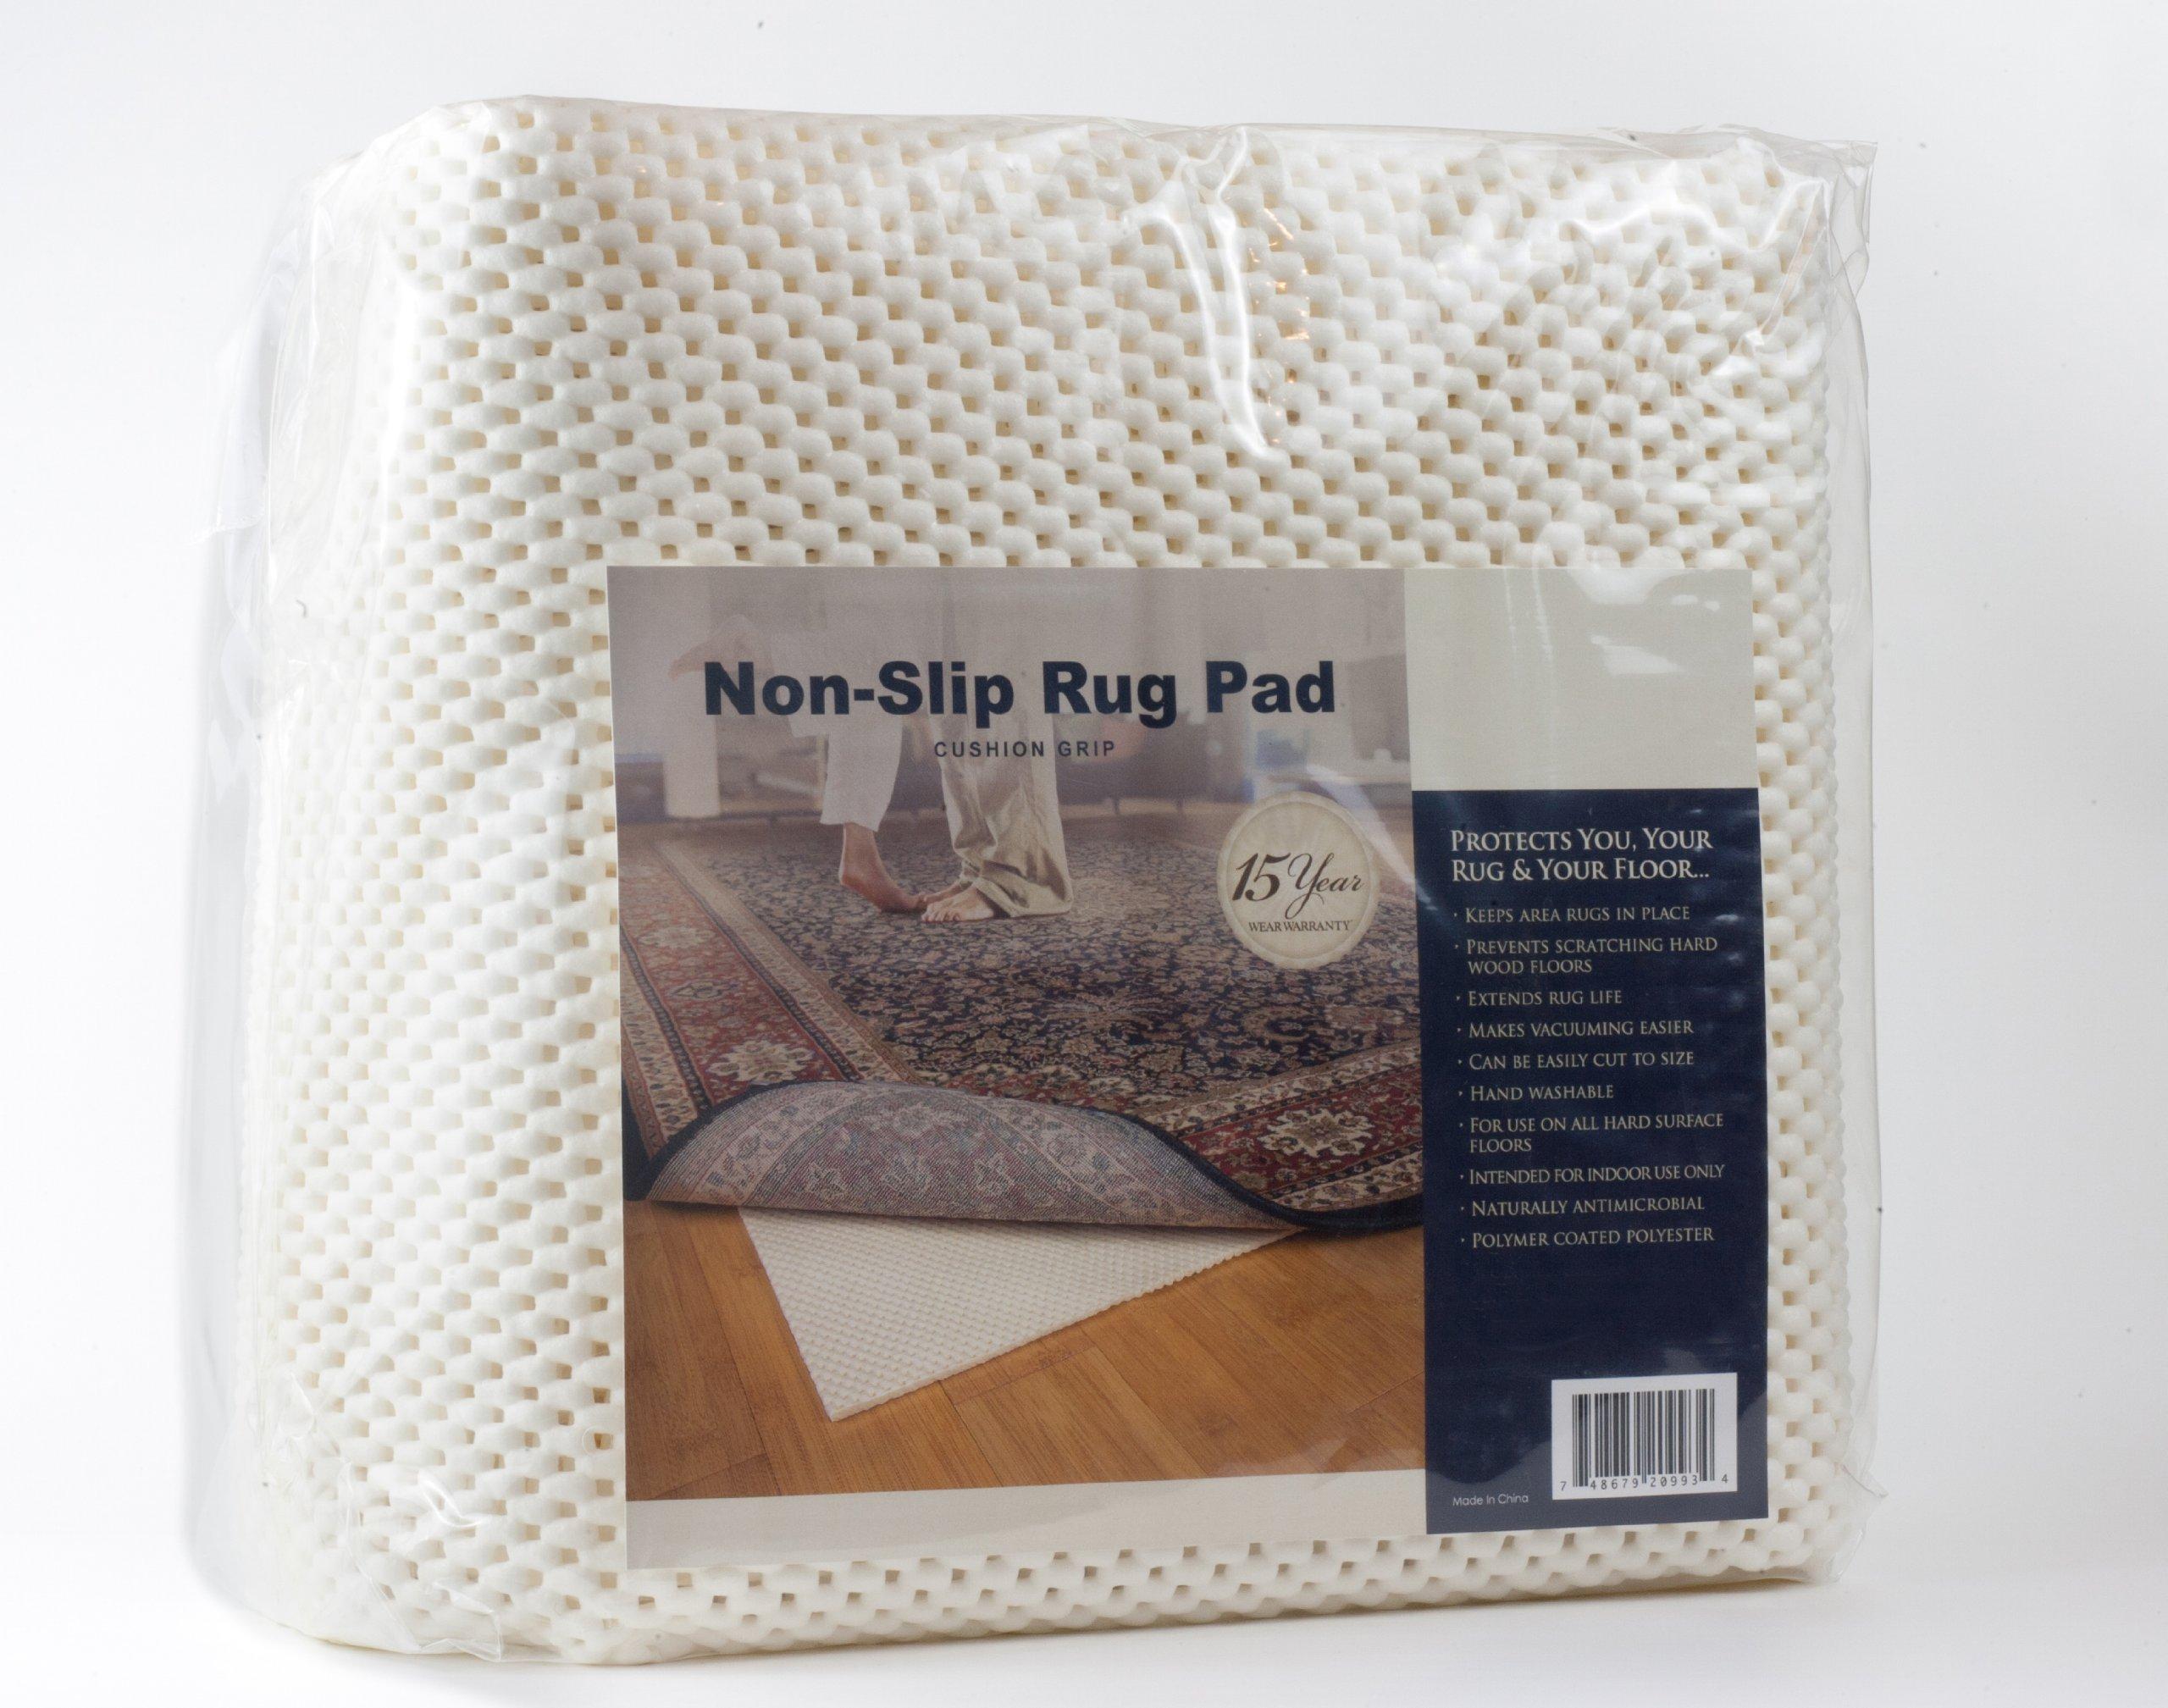 Granville Rugs Cushion Grip Non-skid Area Rug Pad 8-Feet Round Rug